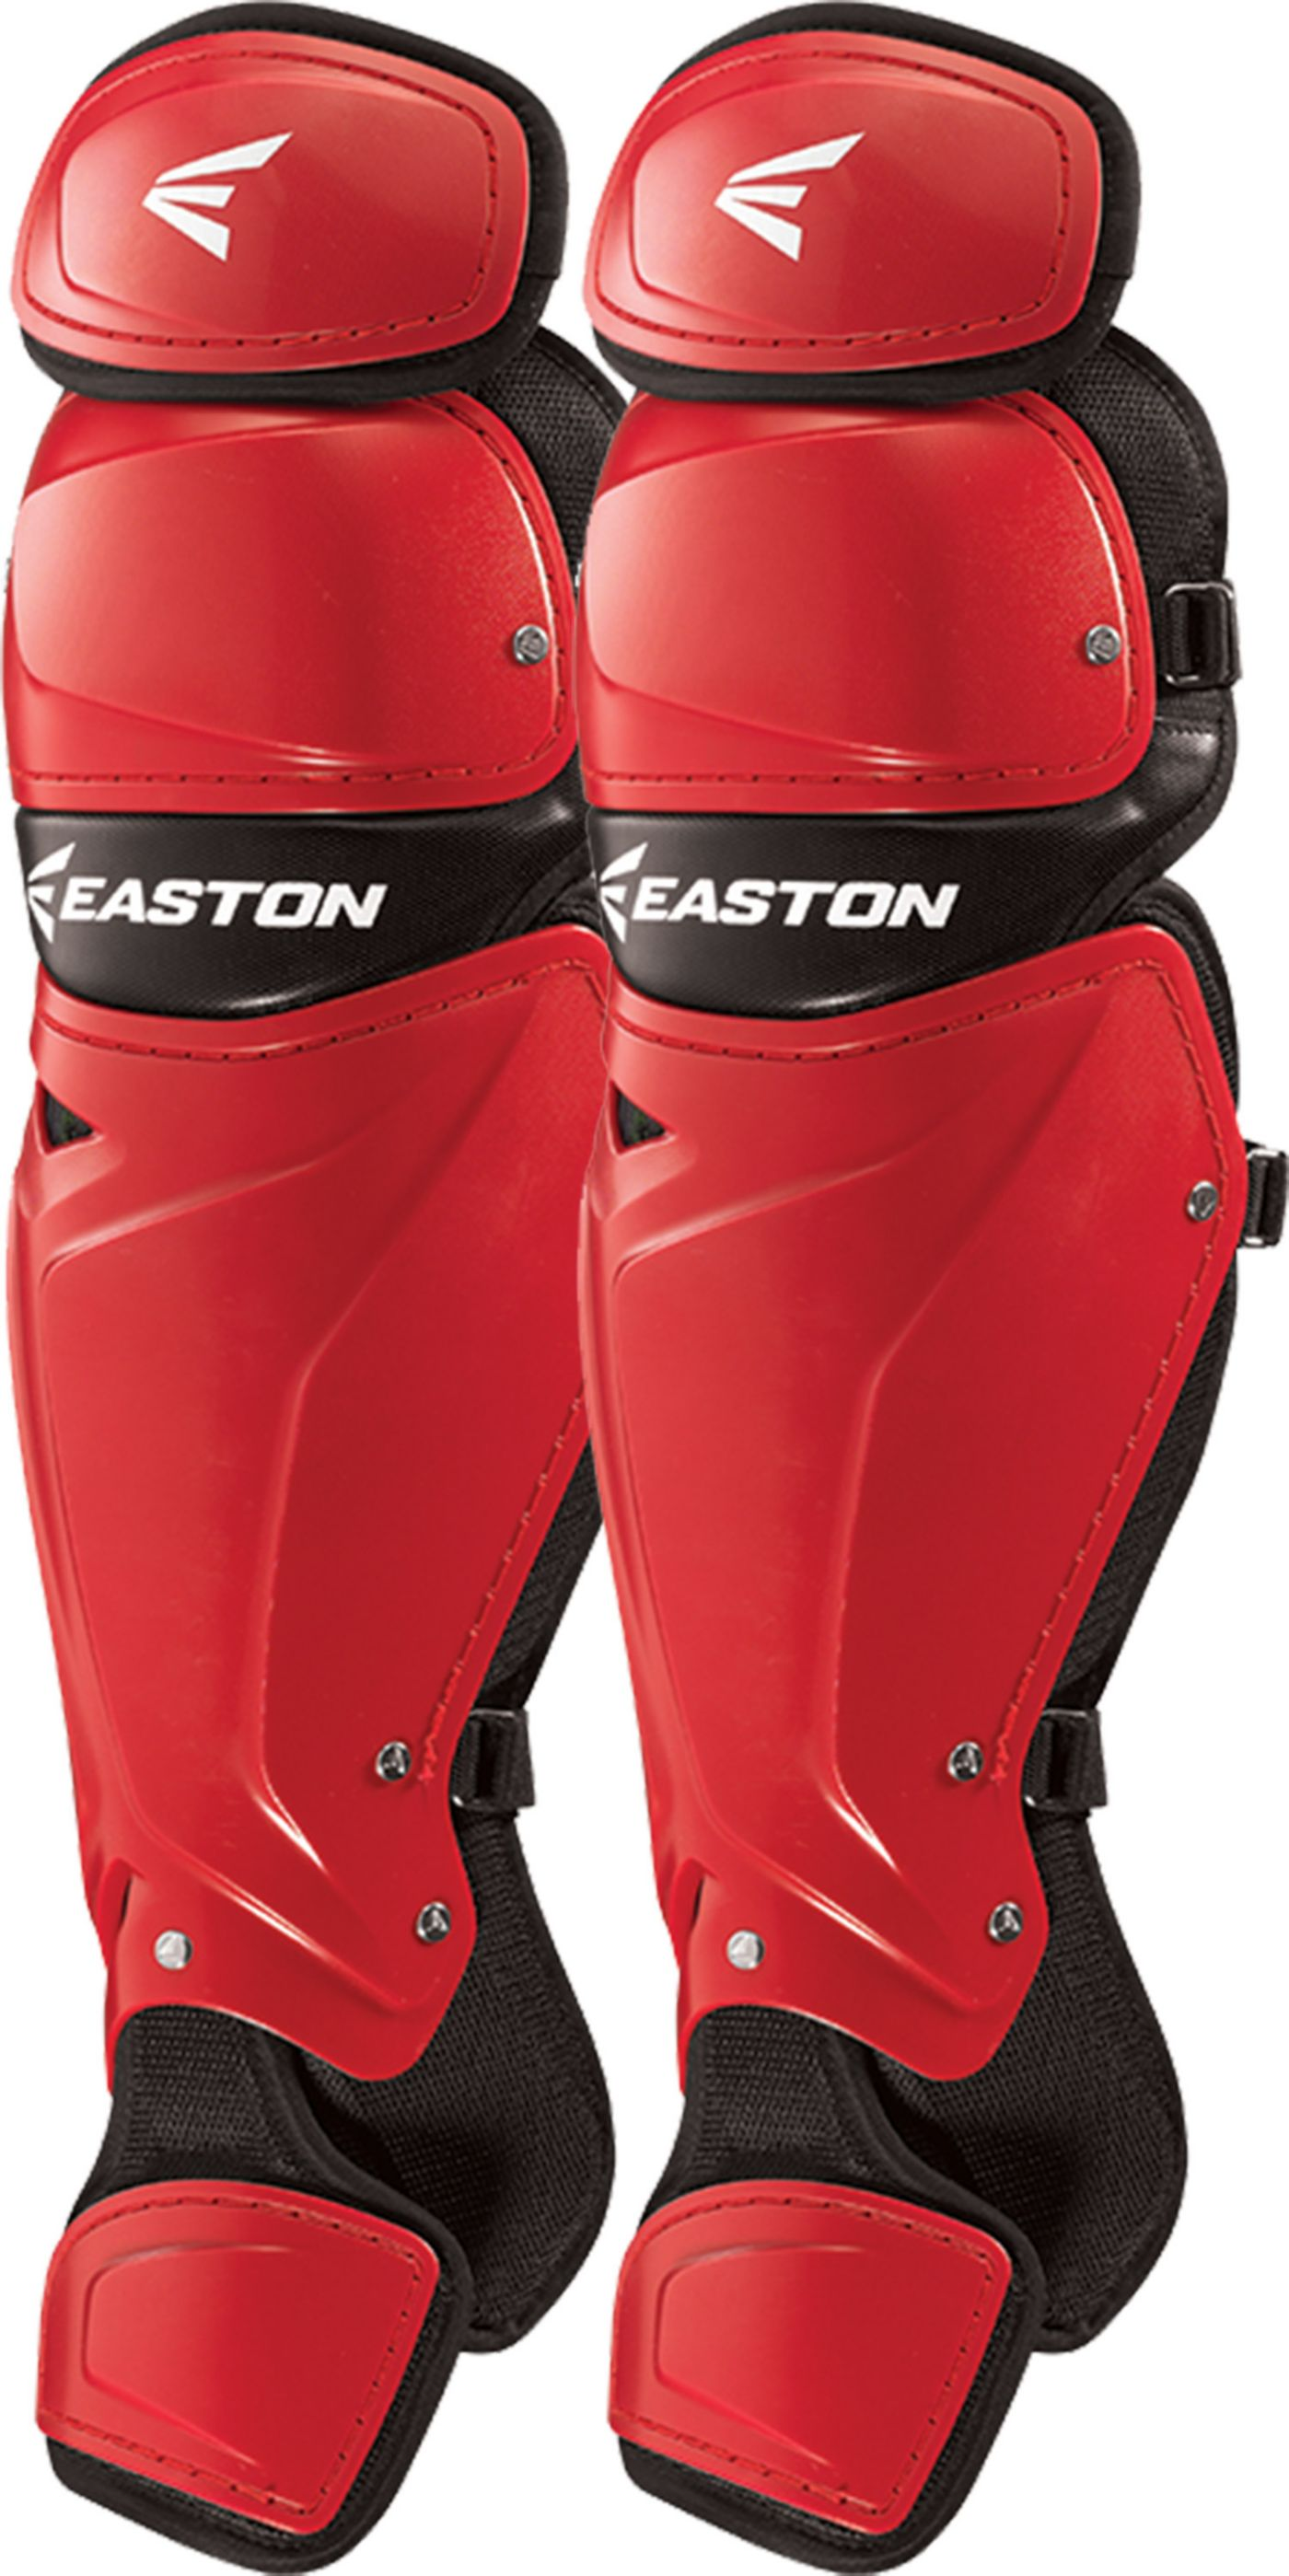 Easton Adult Mako Catcher's Leg Guards